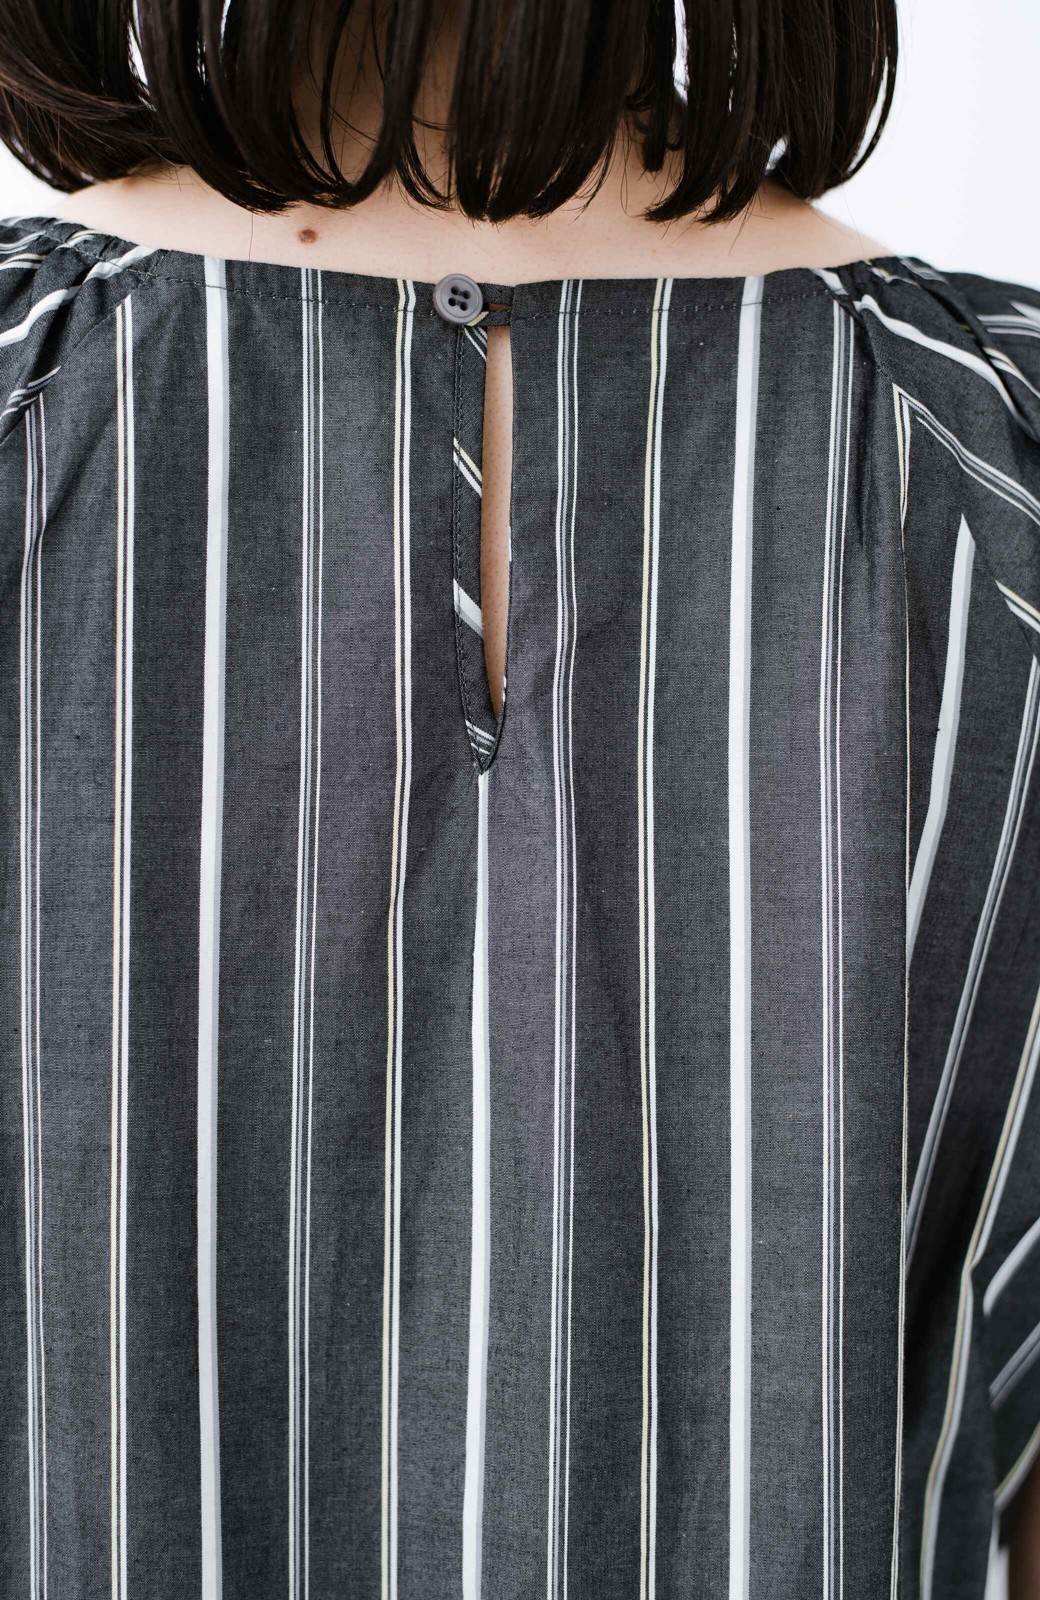 haco! パッと着て、今っぽかわいくなれる ウエストリボンがポイントのマルチストライプワンピース <ブラック>の商品写真3